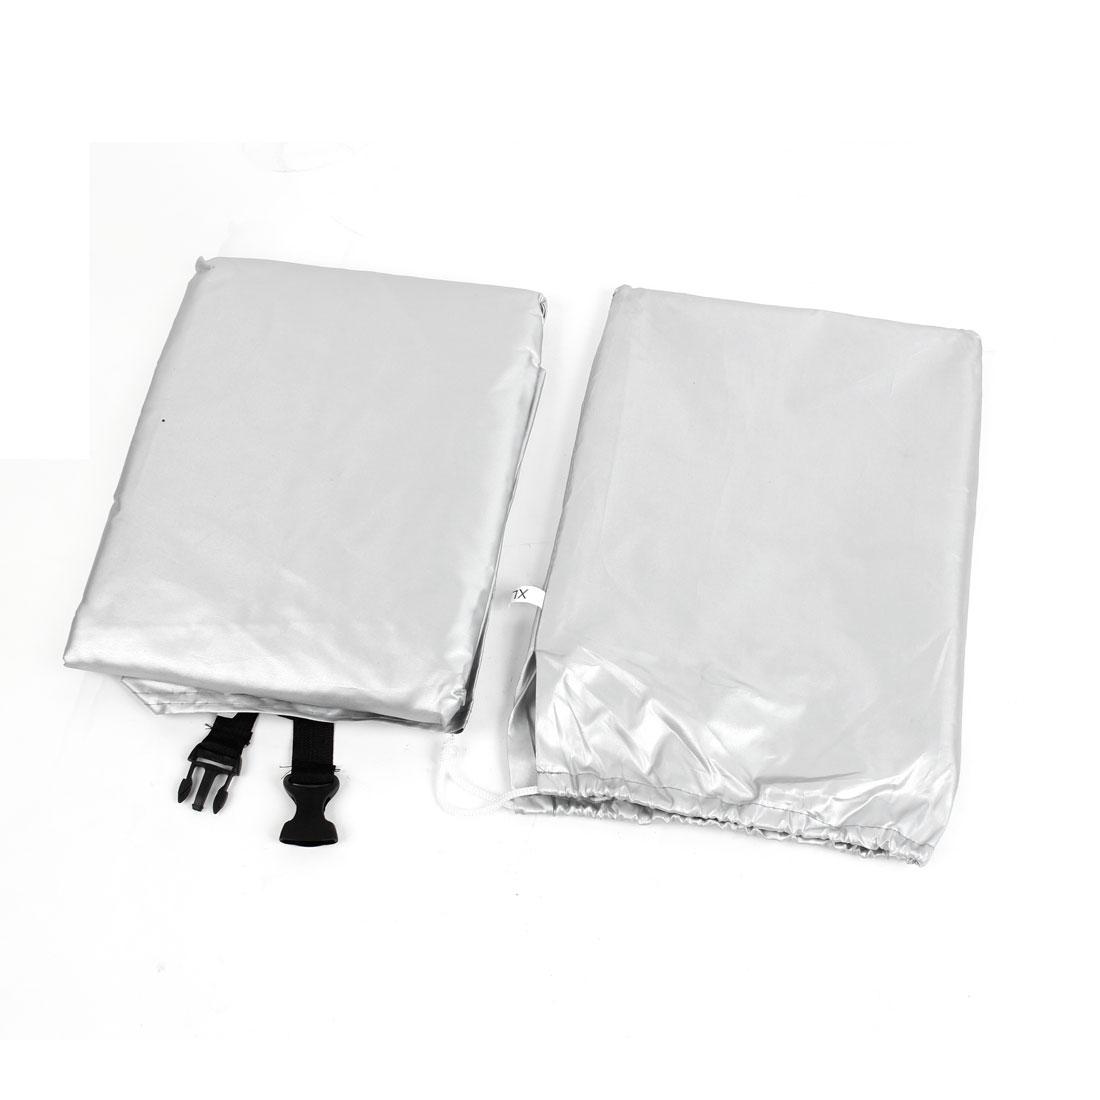 Bicycle Bike Rain Dust Storage Waterproof Cover Protector Black Silver Tone